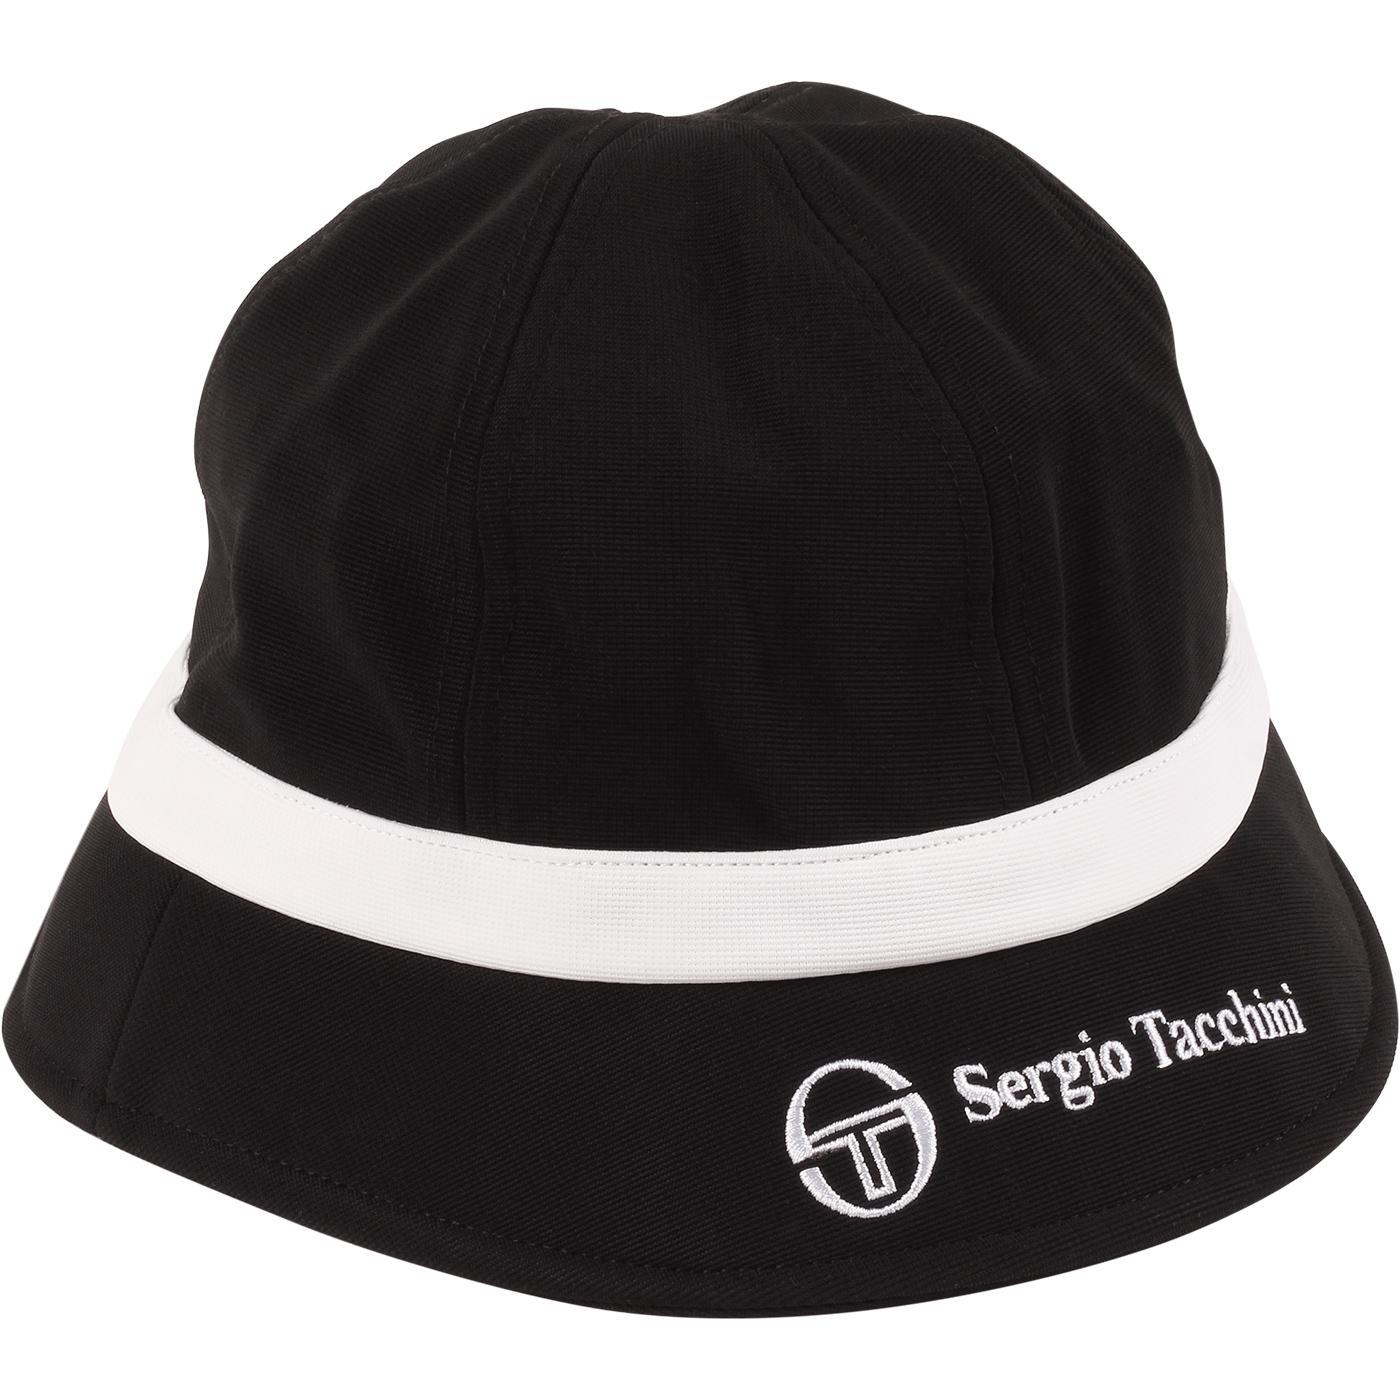 Fyan SERGIO TACCHINI Retro 1990s Bucket Hat (B/W)